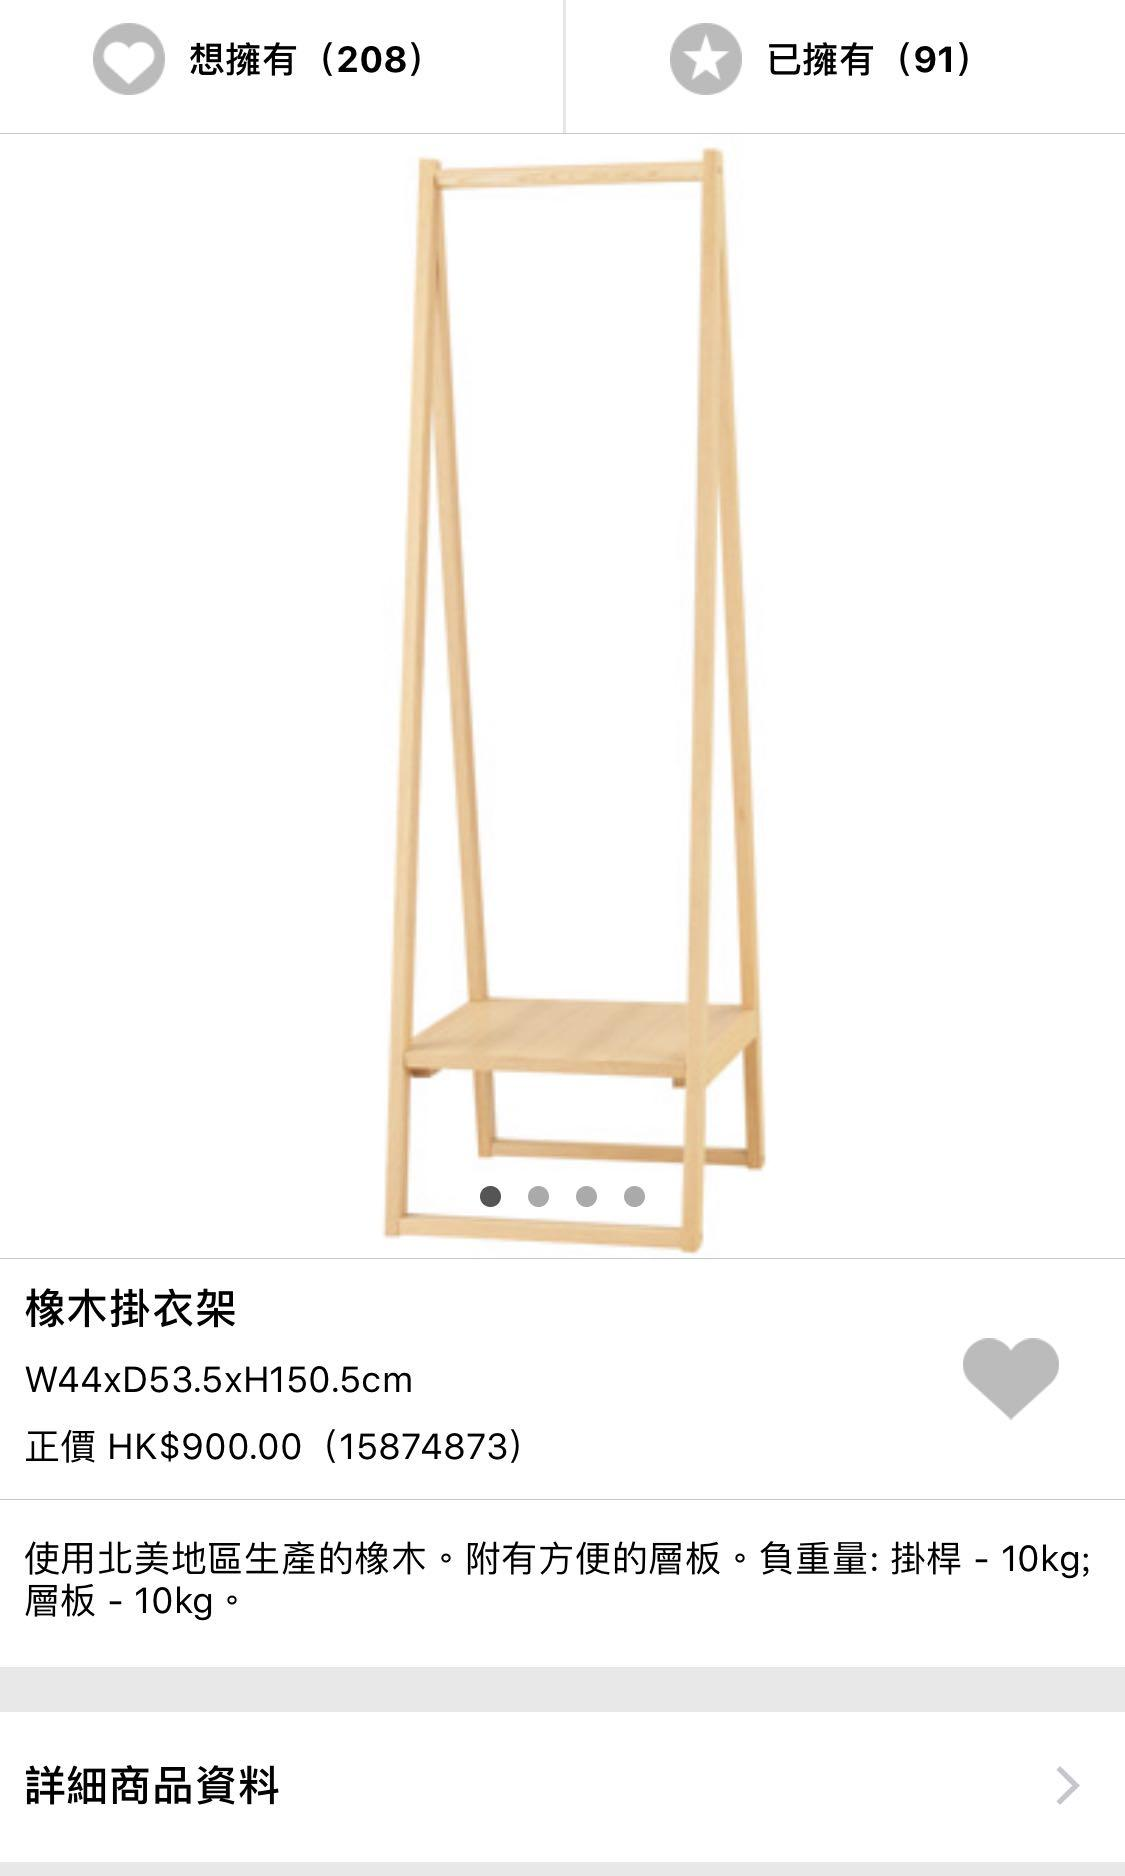 無印良品橡木掛衣架Muji Ikea franc franc